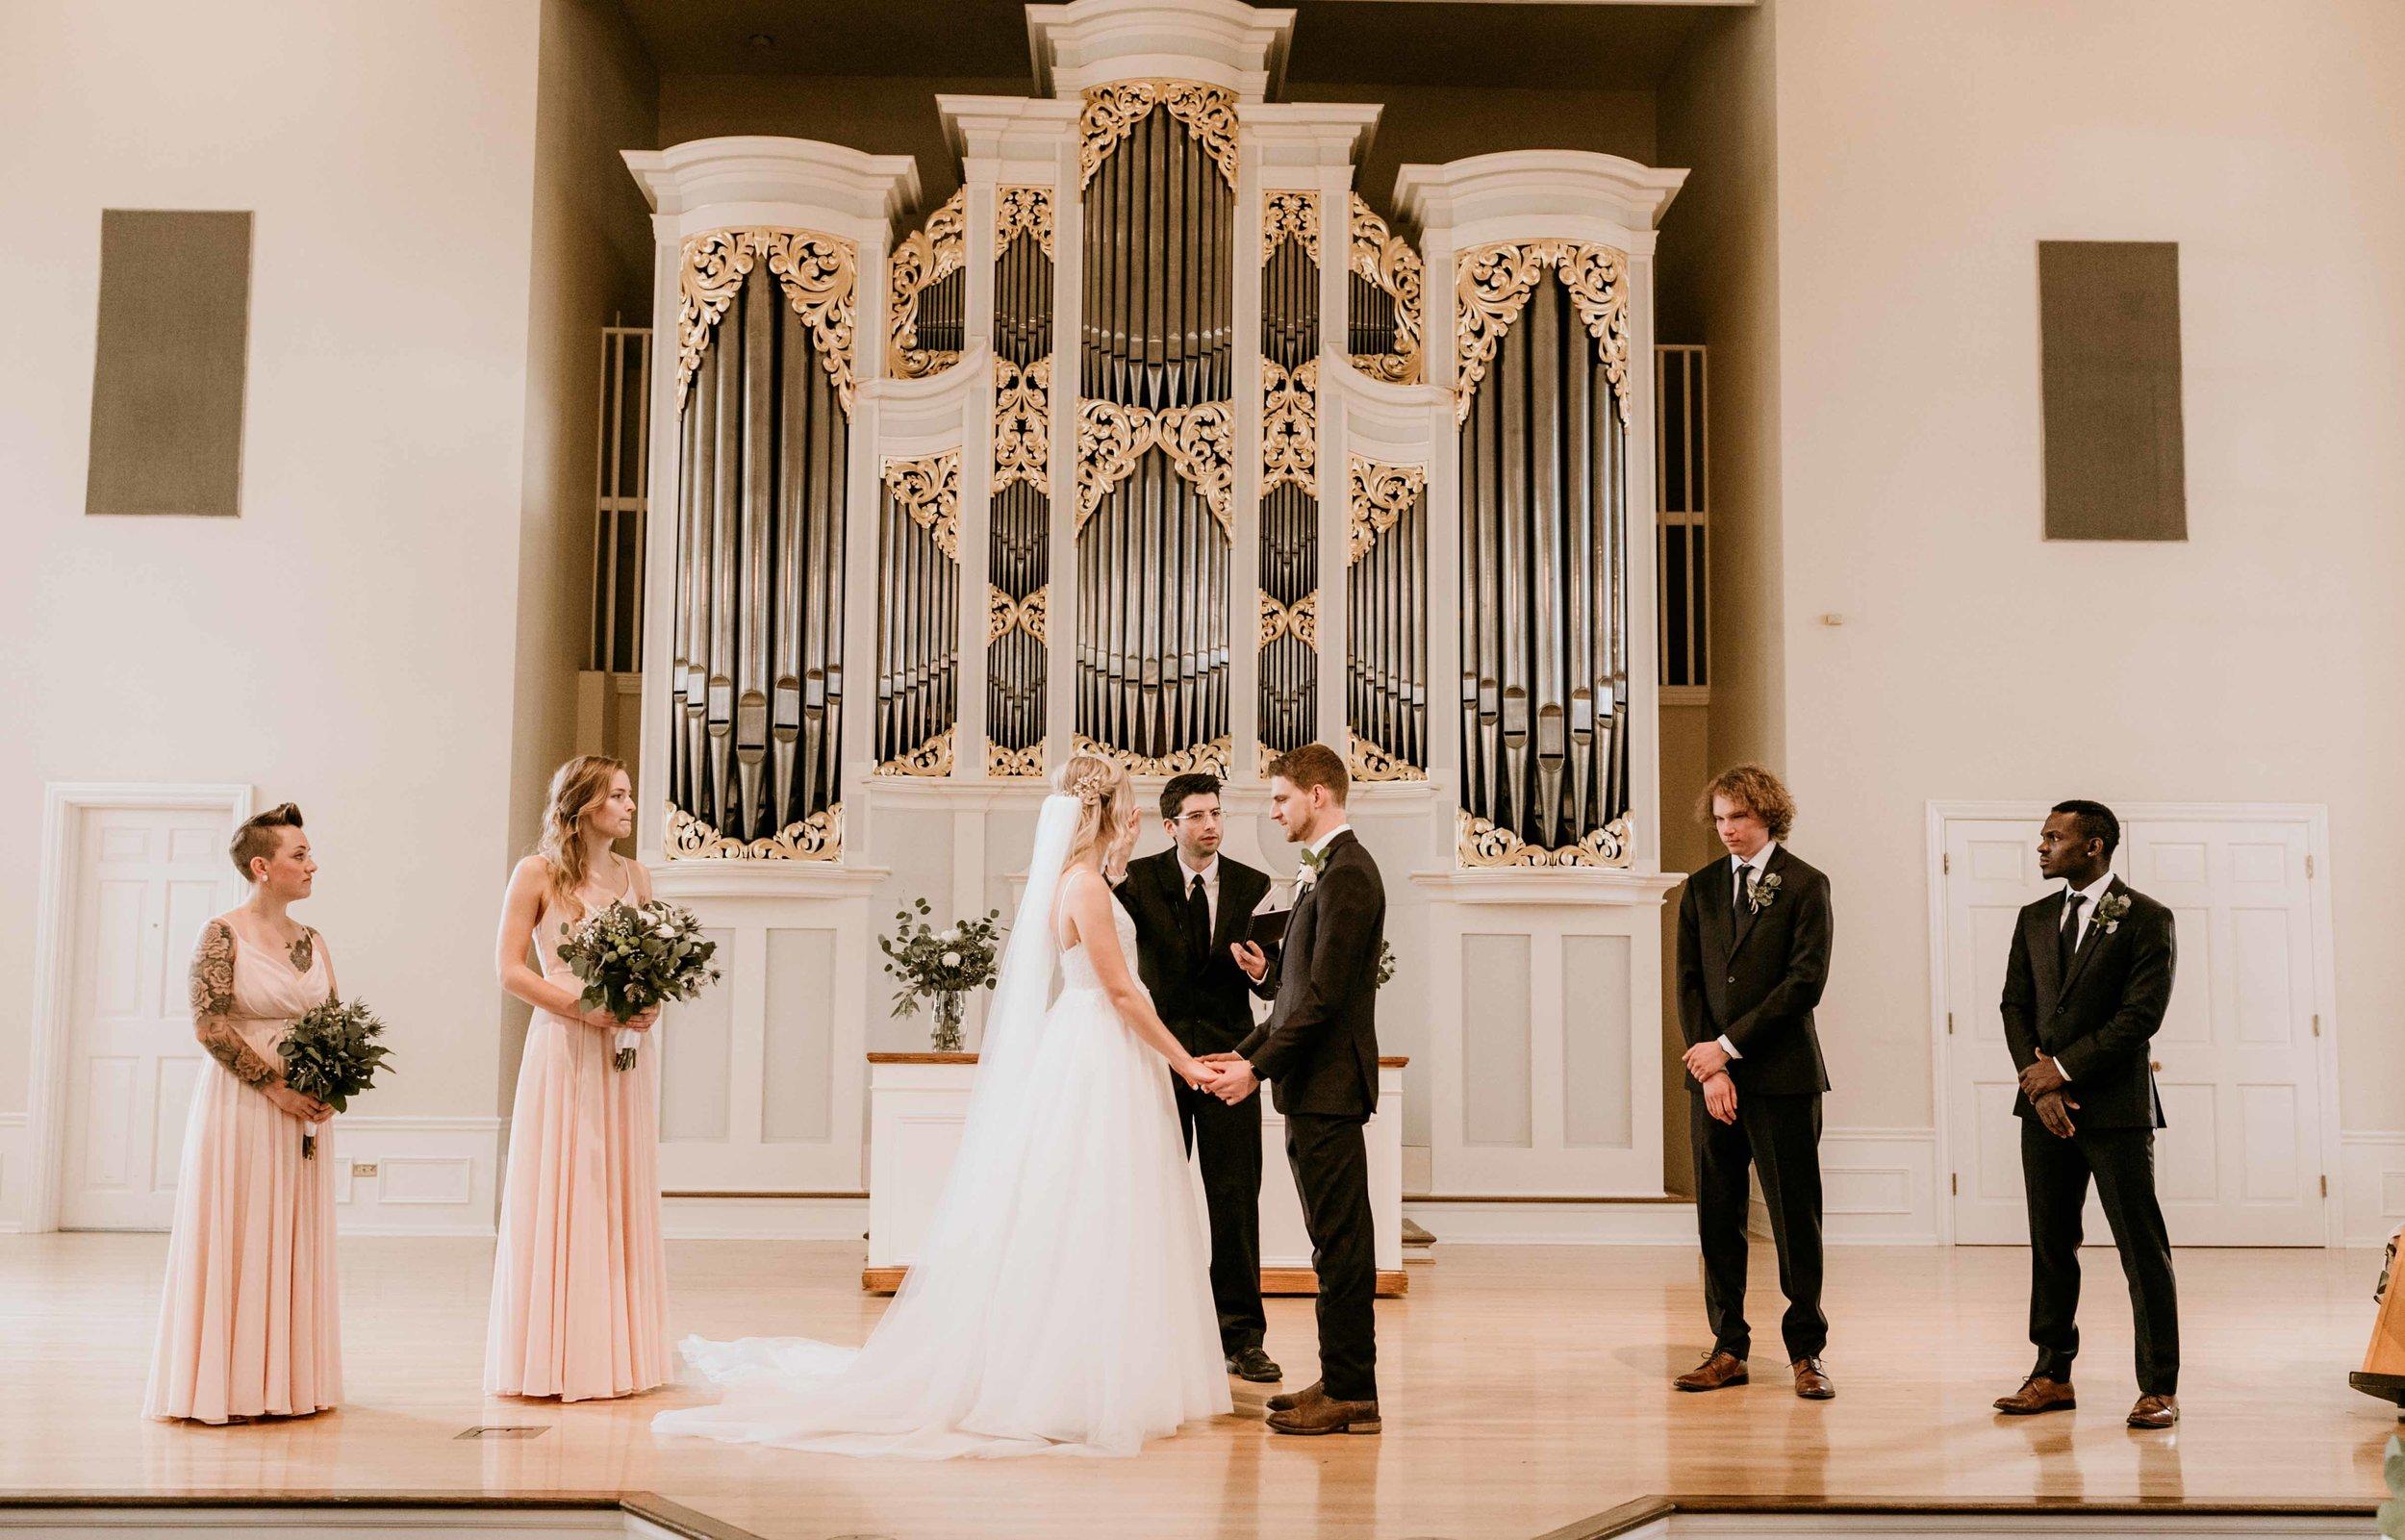 kilworth-memorial-chapel-wedding-64.jpg